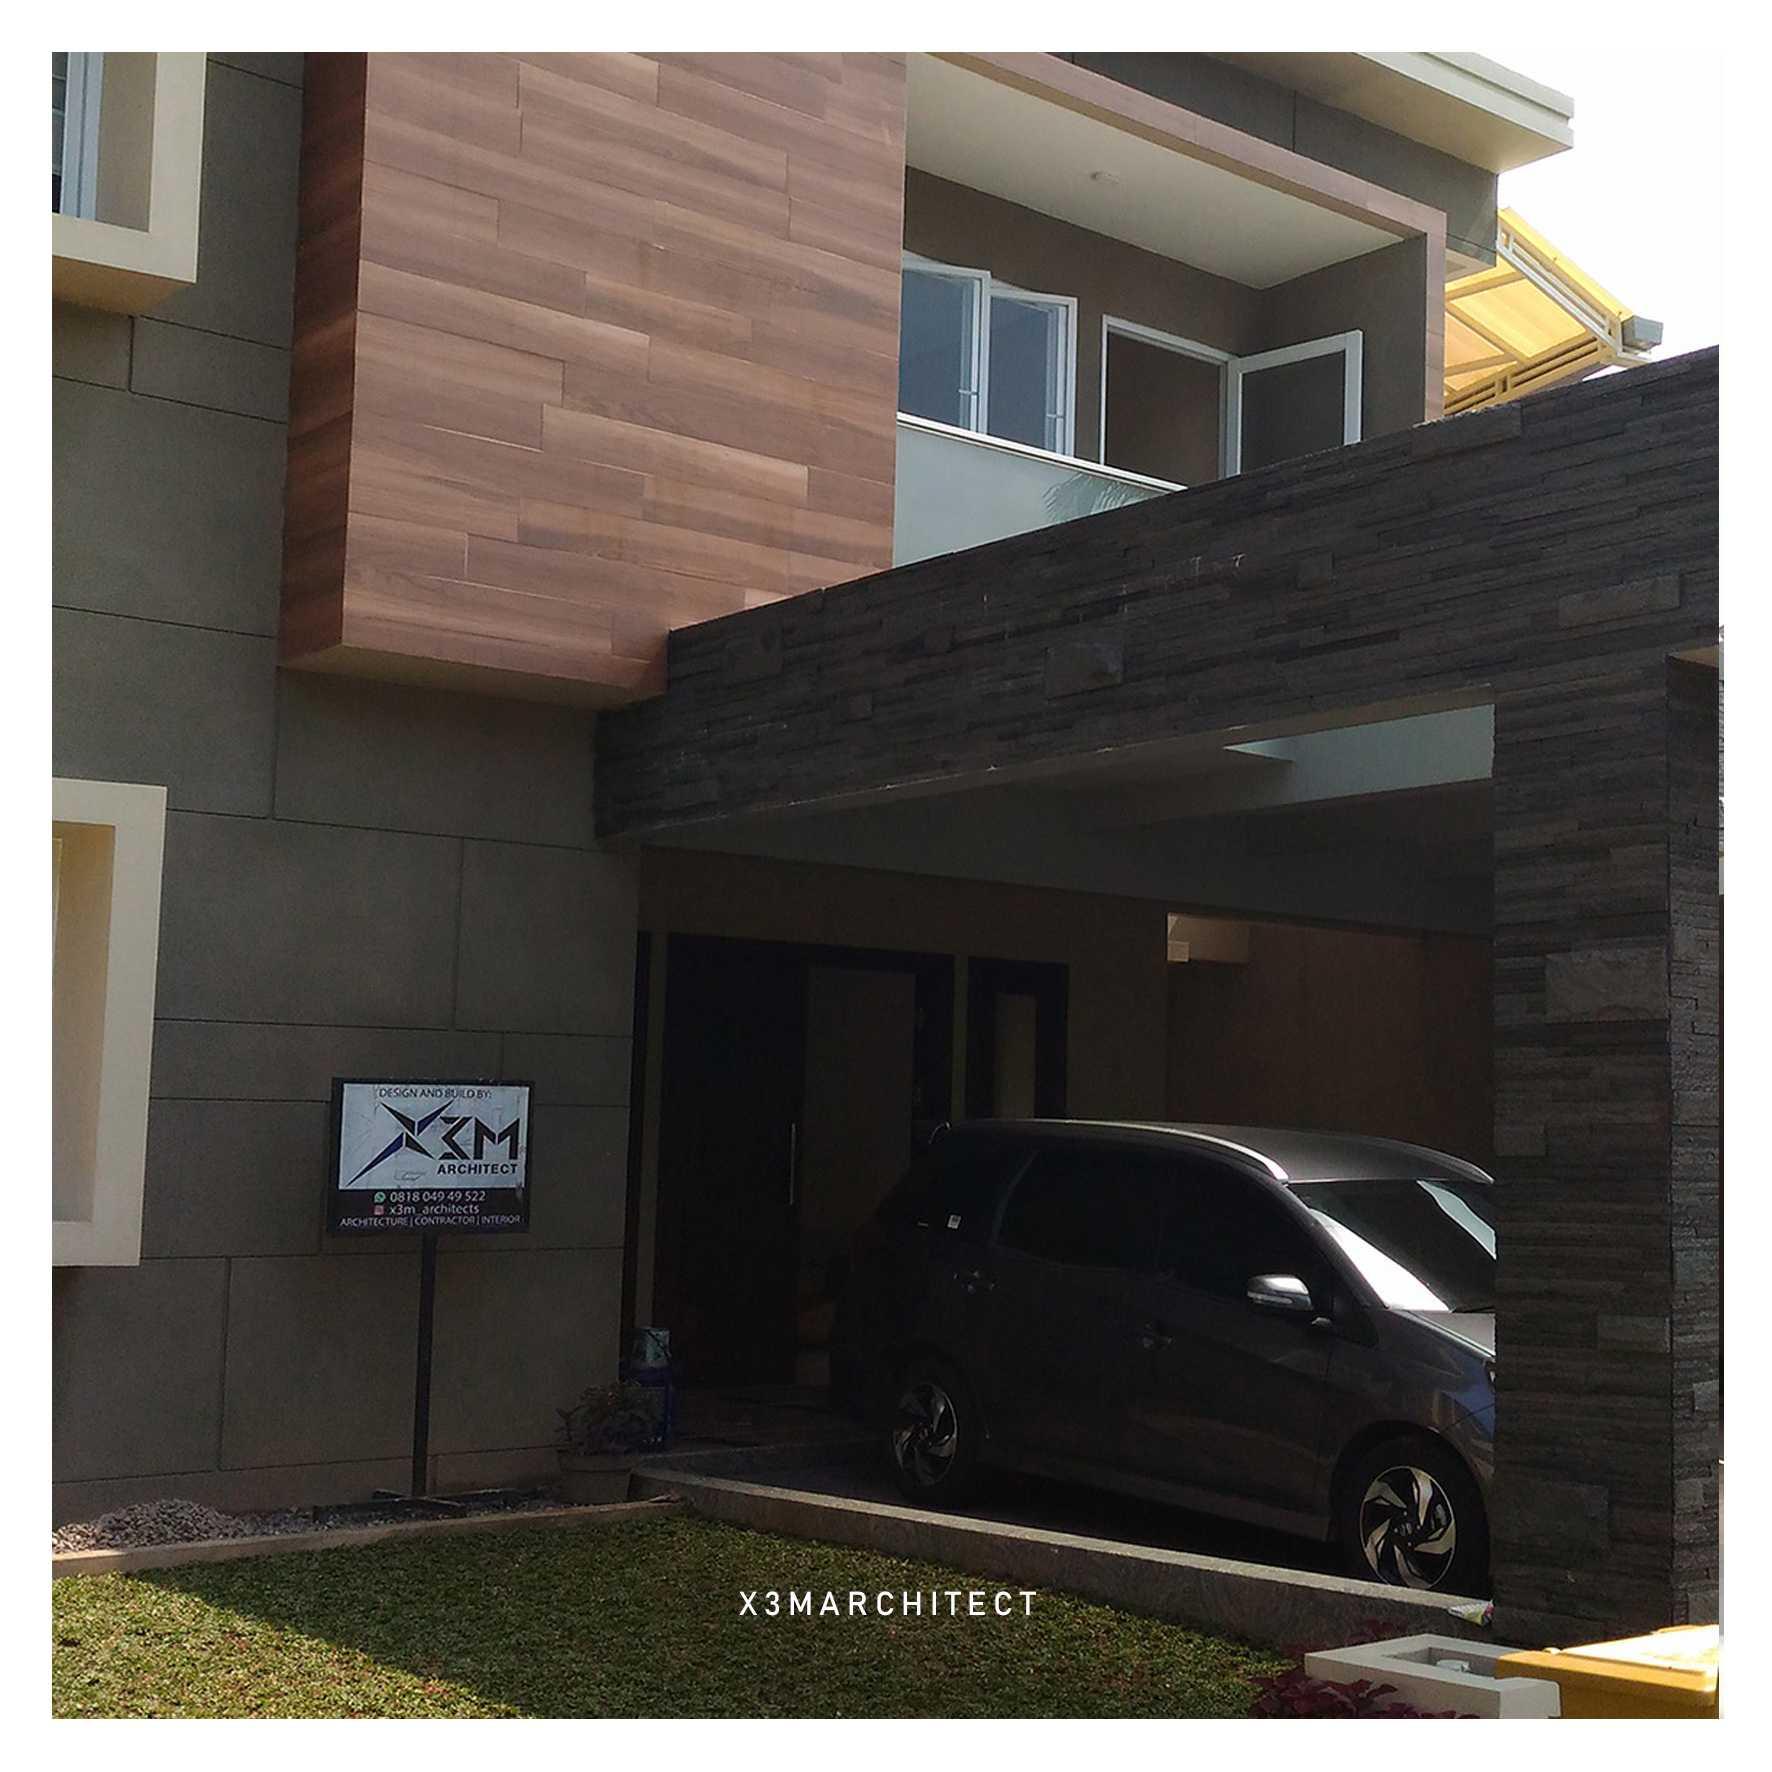 X3M Architects Beringin Golf Residence Jl. Cendana Golf No.2, Bencongan, Klp. Dua, Tangerang, Banten 15810, Indonesia Jl. Cendana Golf No.2, Bencongan, Klp. Dua, Tangerang, Banten 15810, Indonesia X3M-Architects-Beringin-Golf-Residence   75945